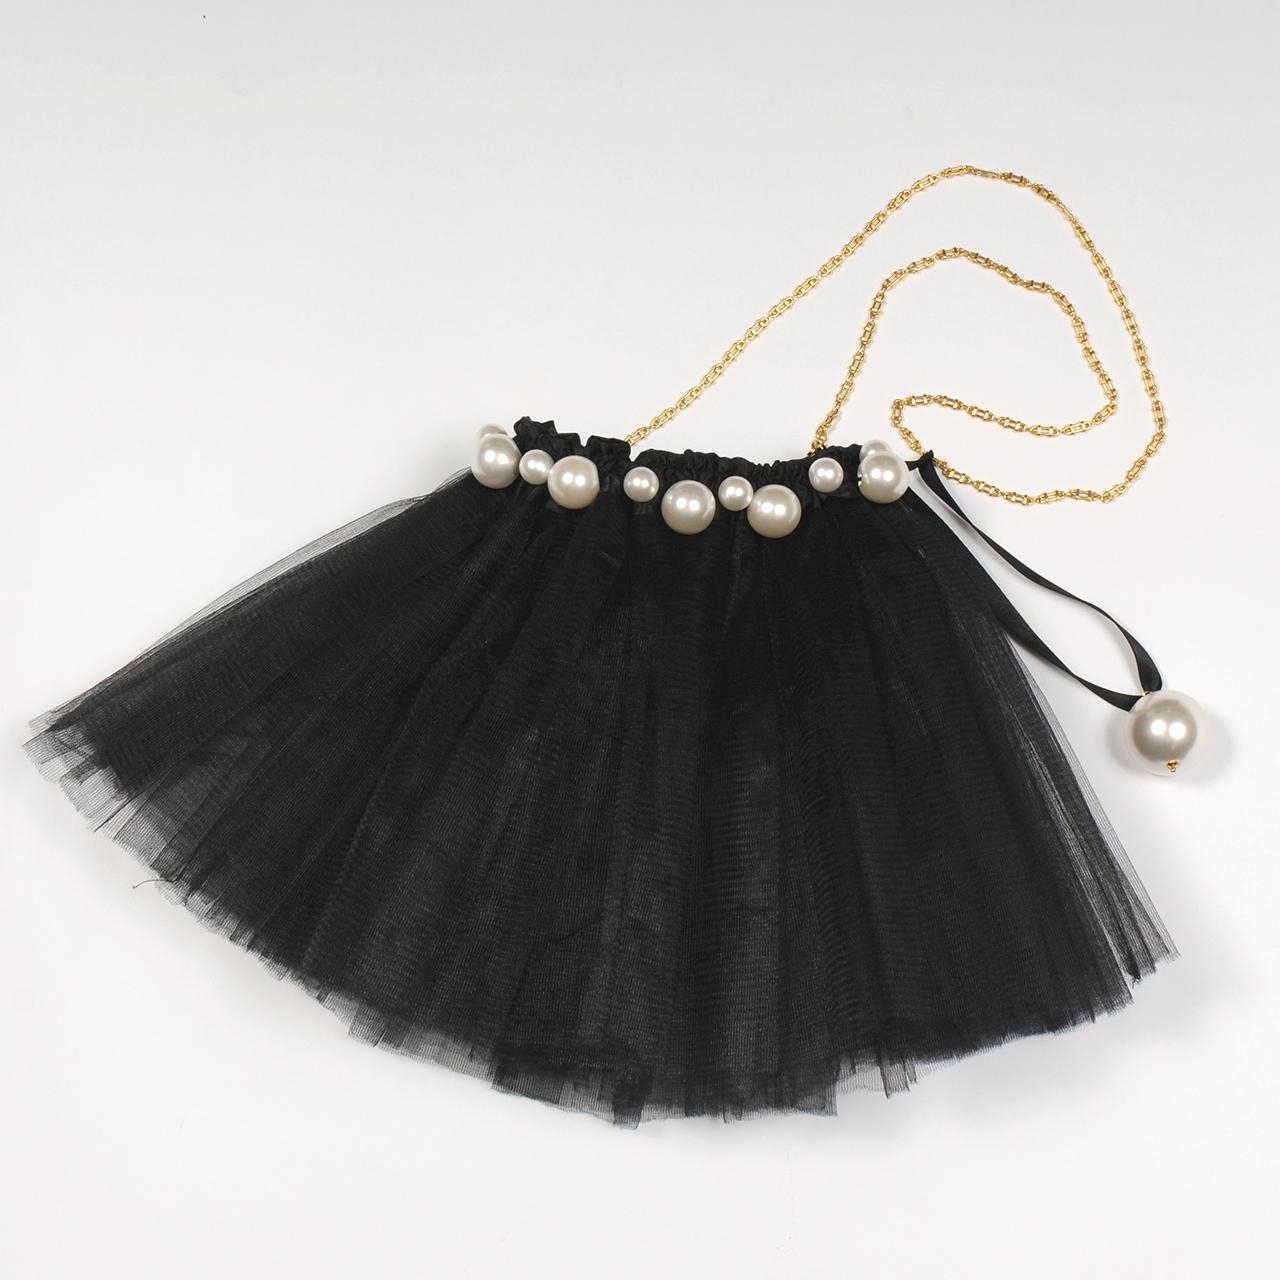 df20SS-FG03 PEARL FLACE BAG (black)